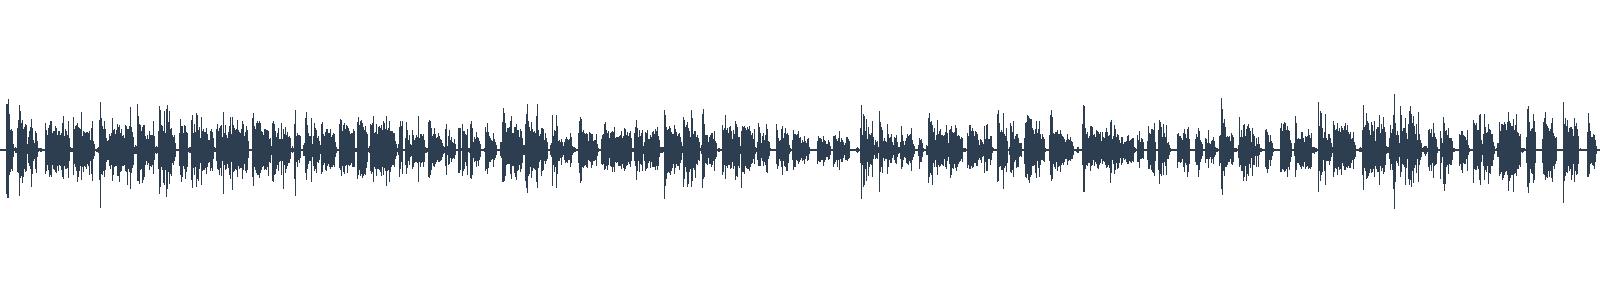 Dedičstvo Boleynovcov waveform